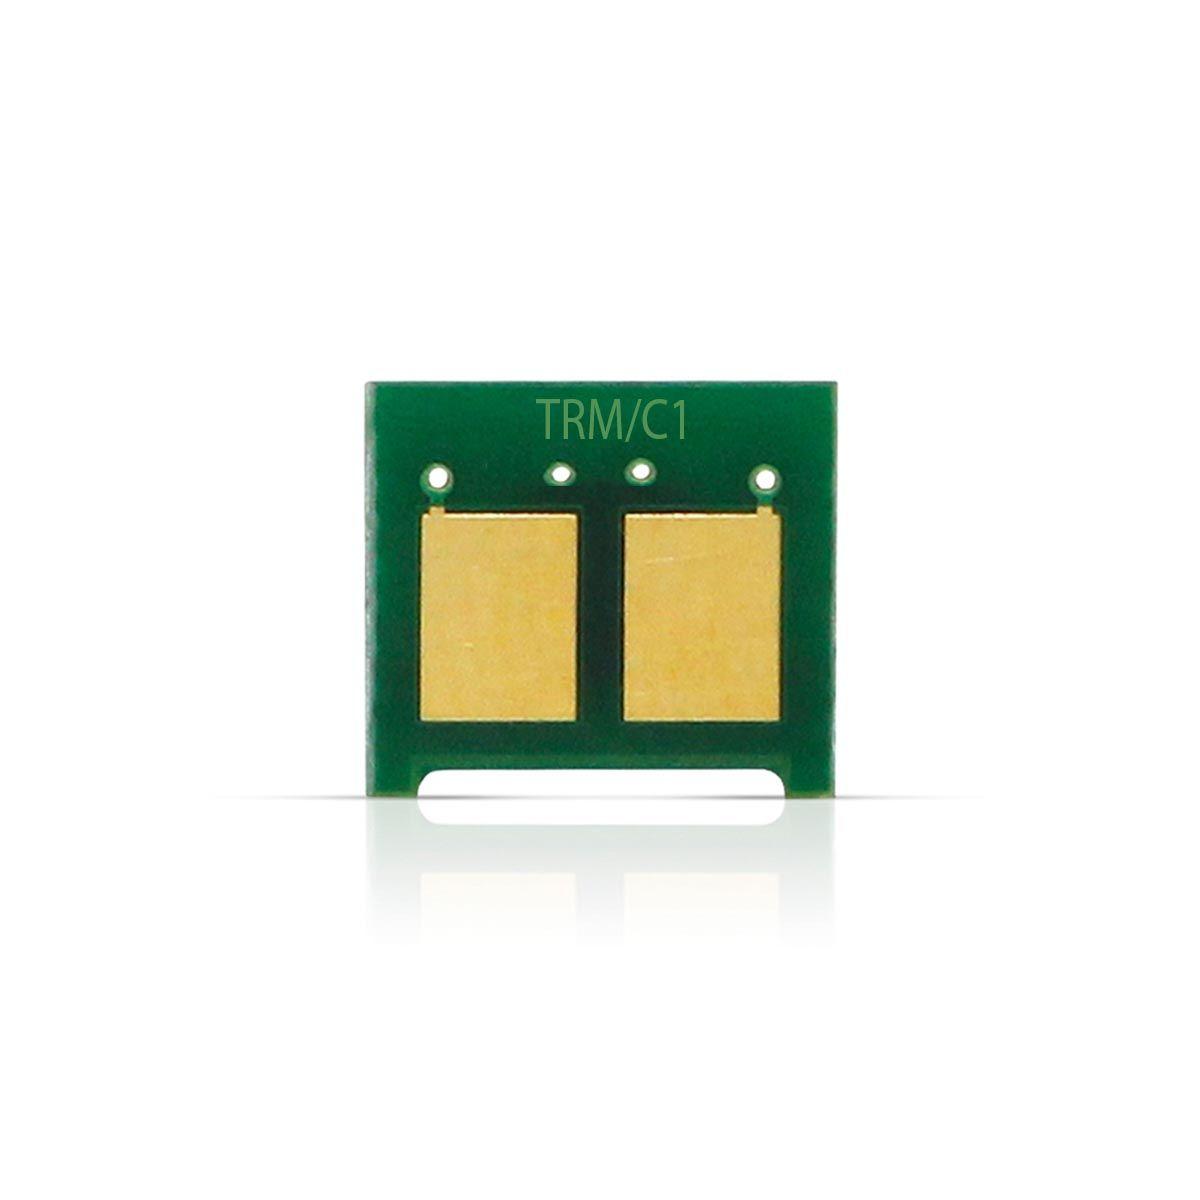 SMART CHIP HP CB543A/CC533A/CE253A/313A/323A/403A/413A/CF213A/383A MAGENTA (TRM/C1)